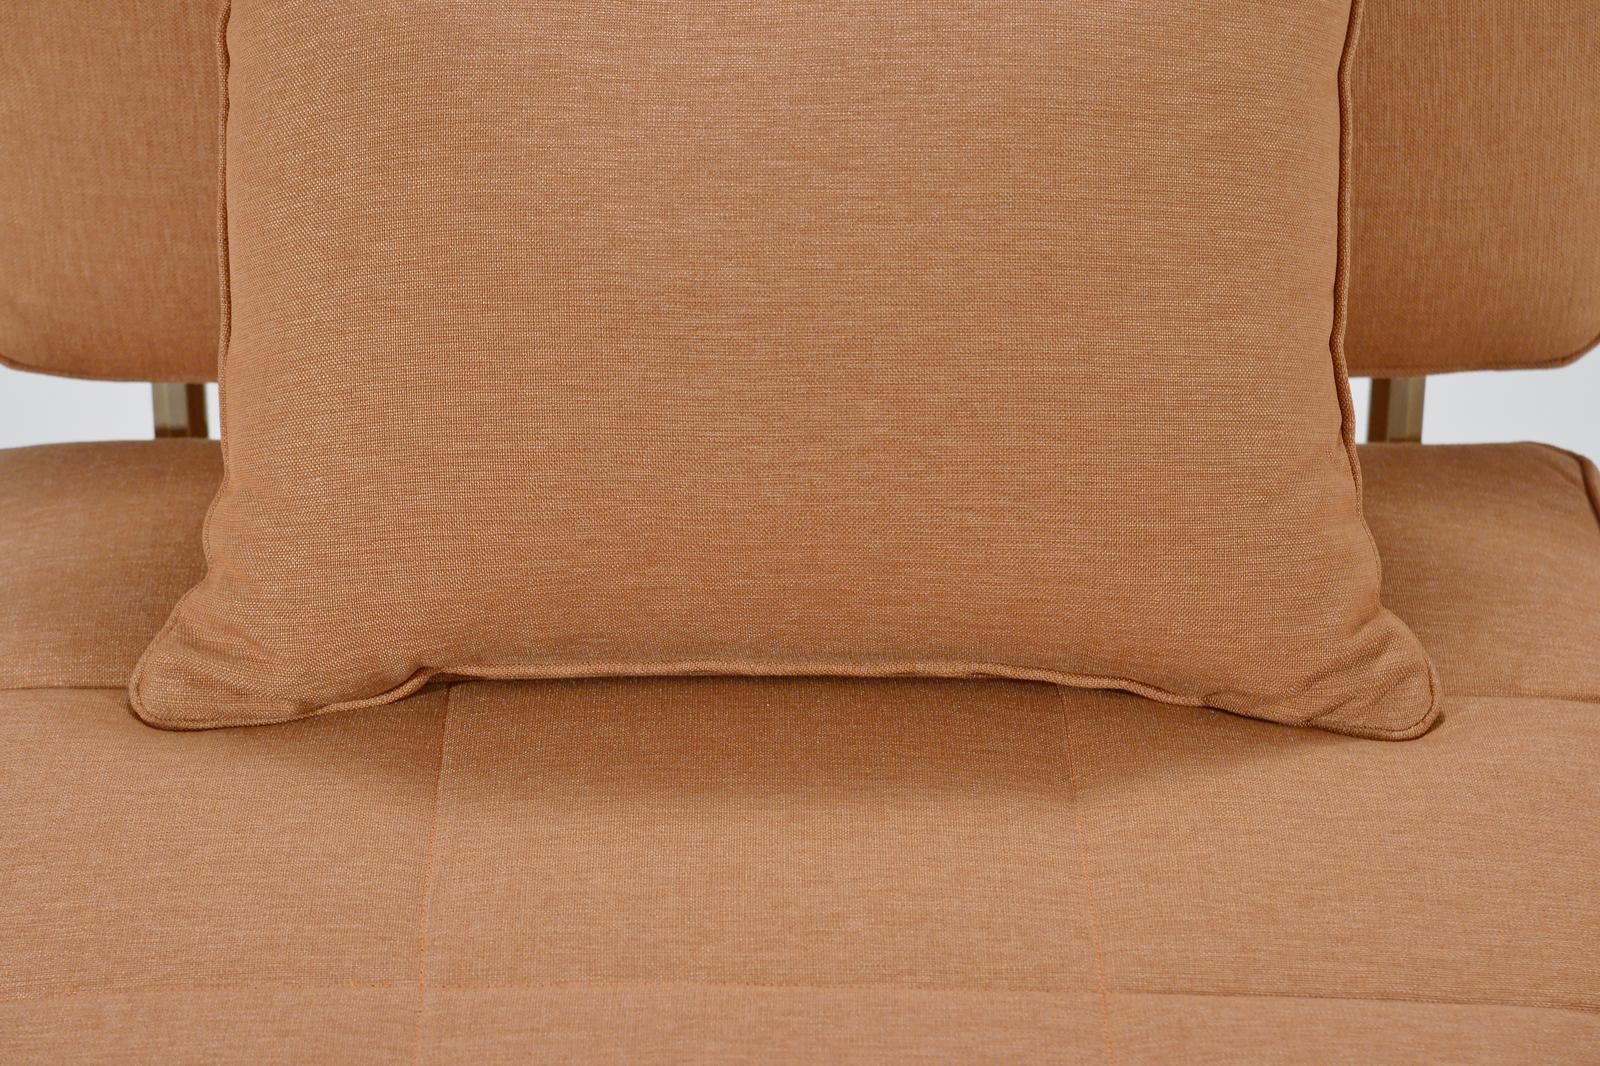 PTendercool-Ourdoor-Sofa-PT73(x8)-BS1-TE-DO-Palm Plain (Henna)-191101-06